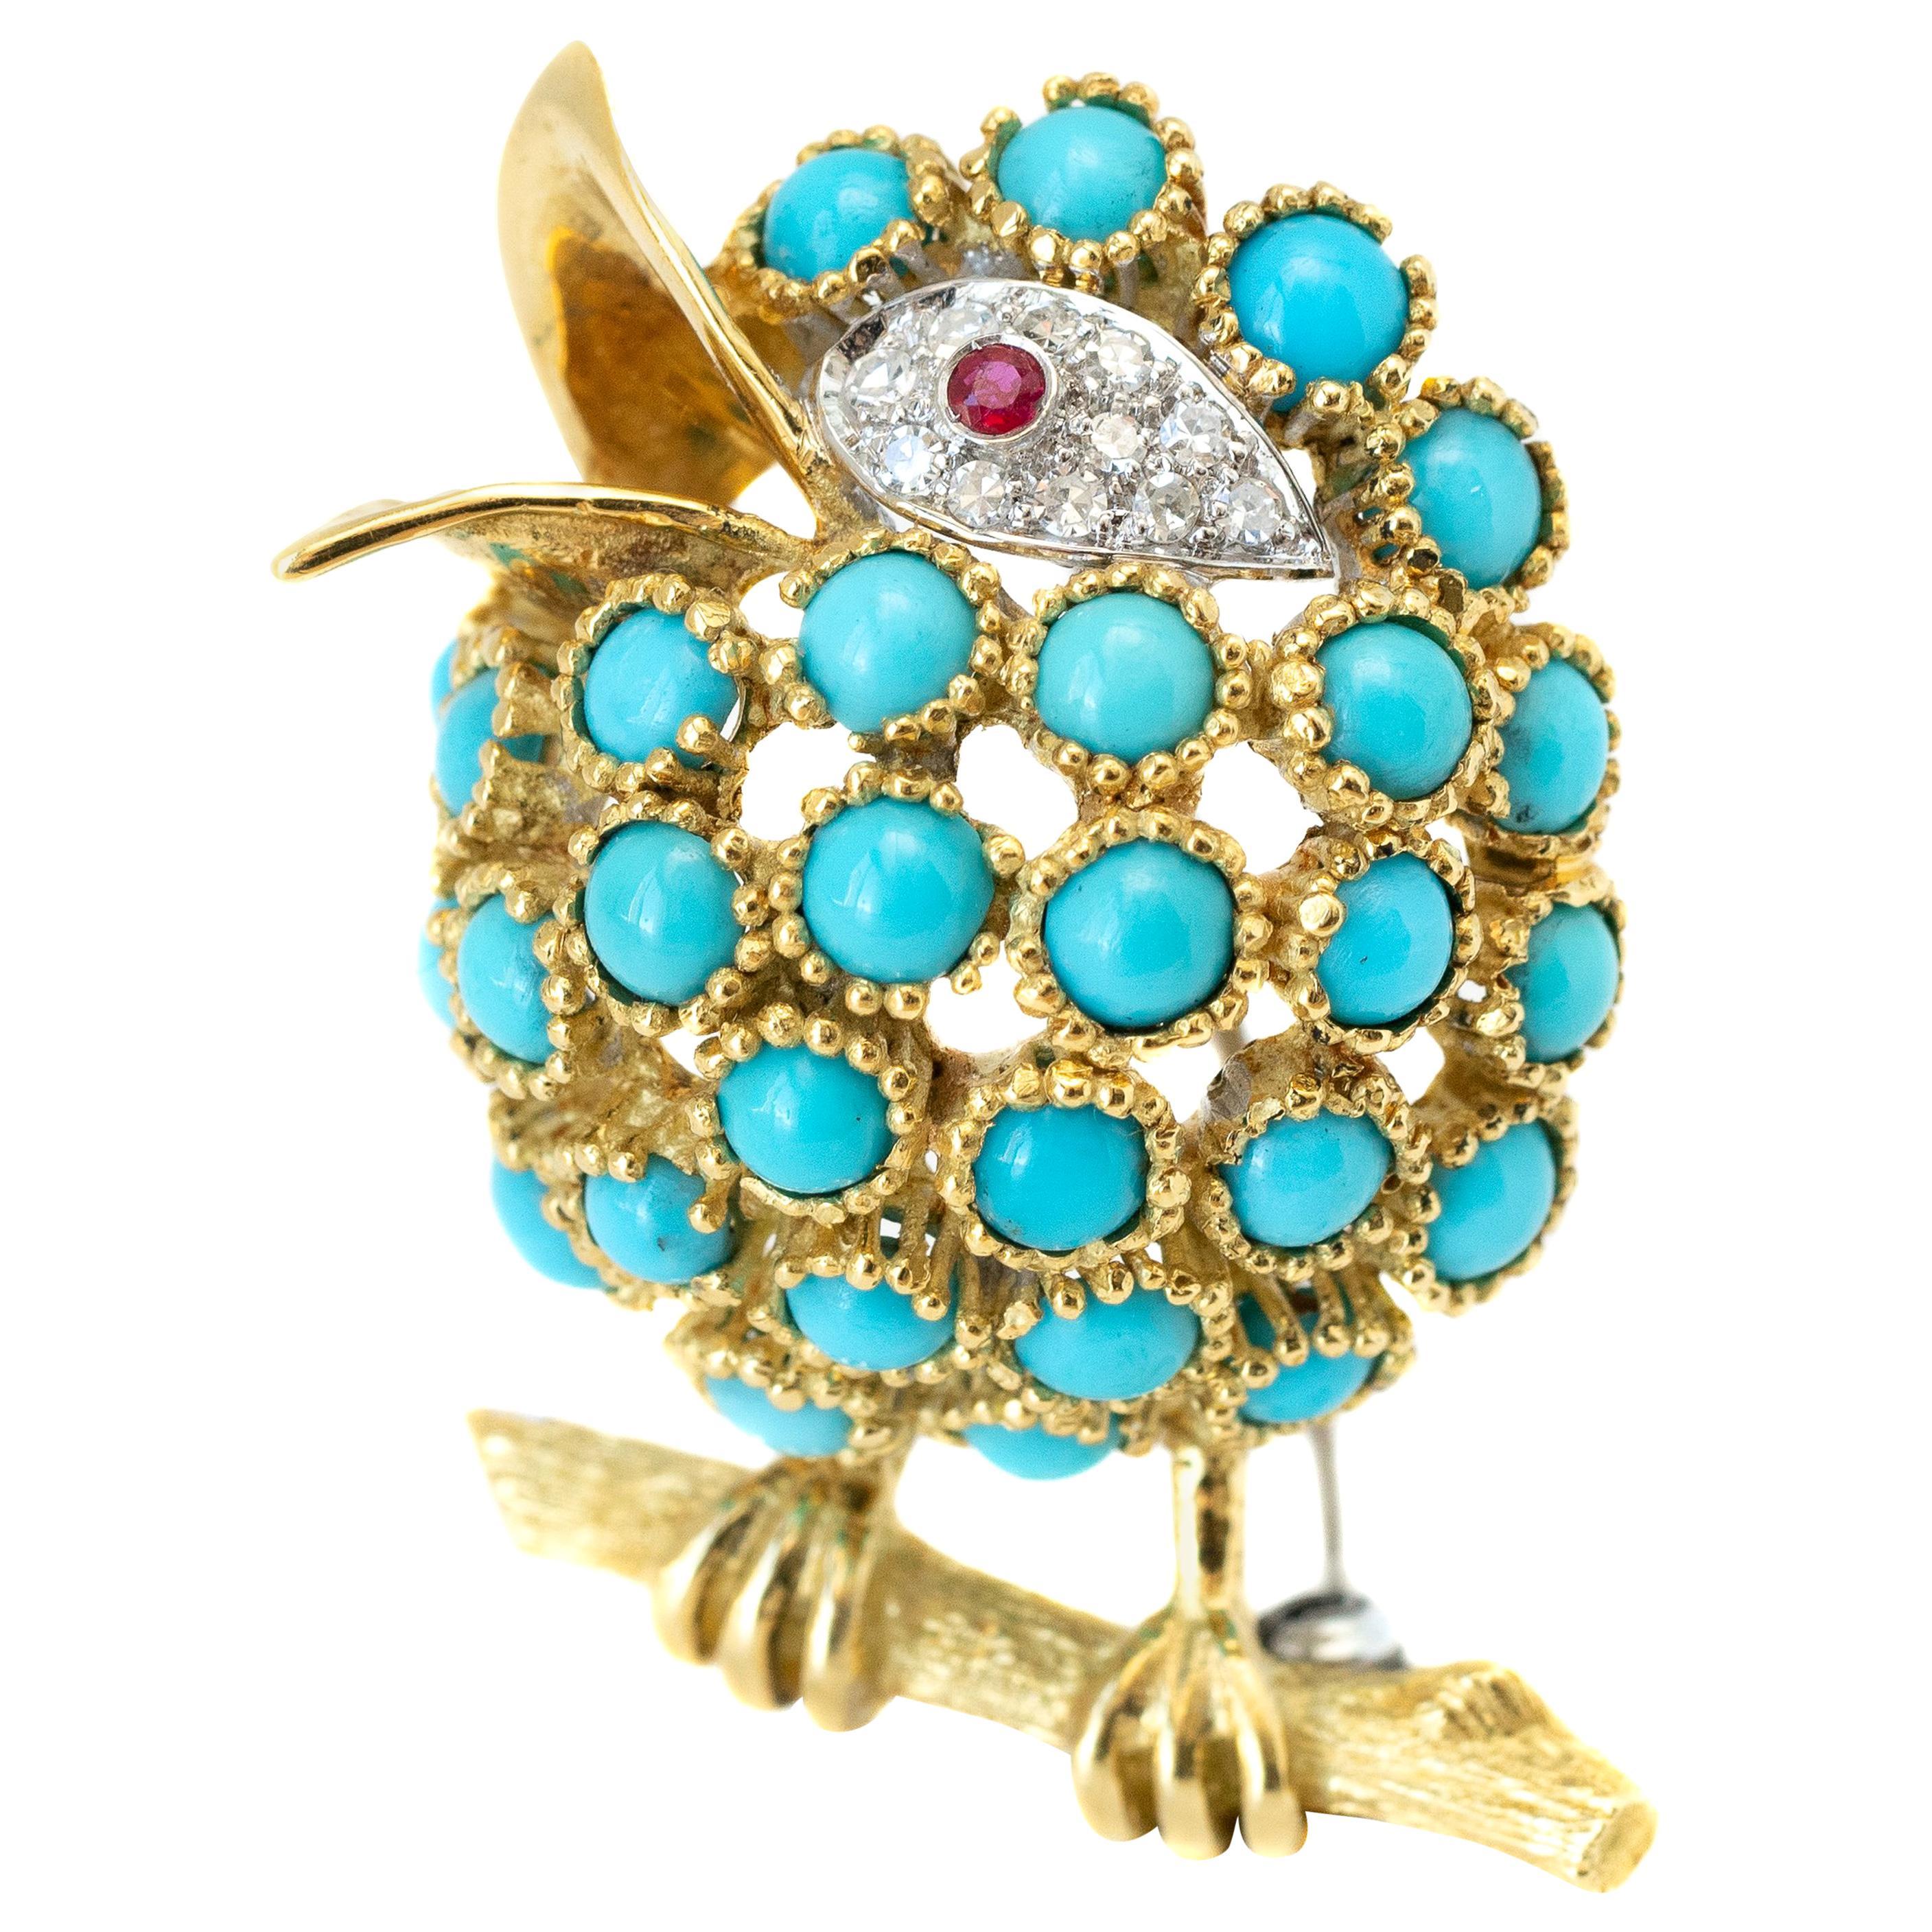 Diamonds, Turquoise and Ruby 18 Karat Gold Bird Brooch